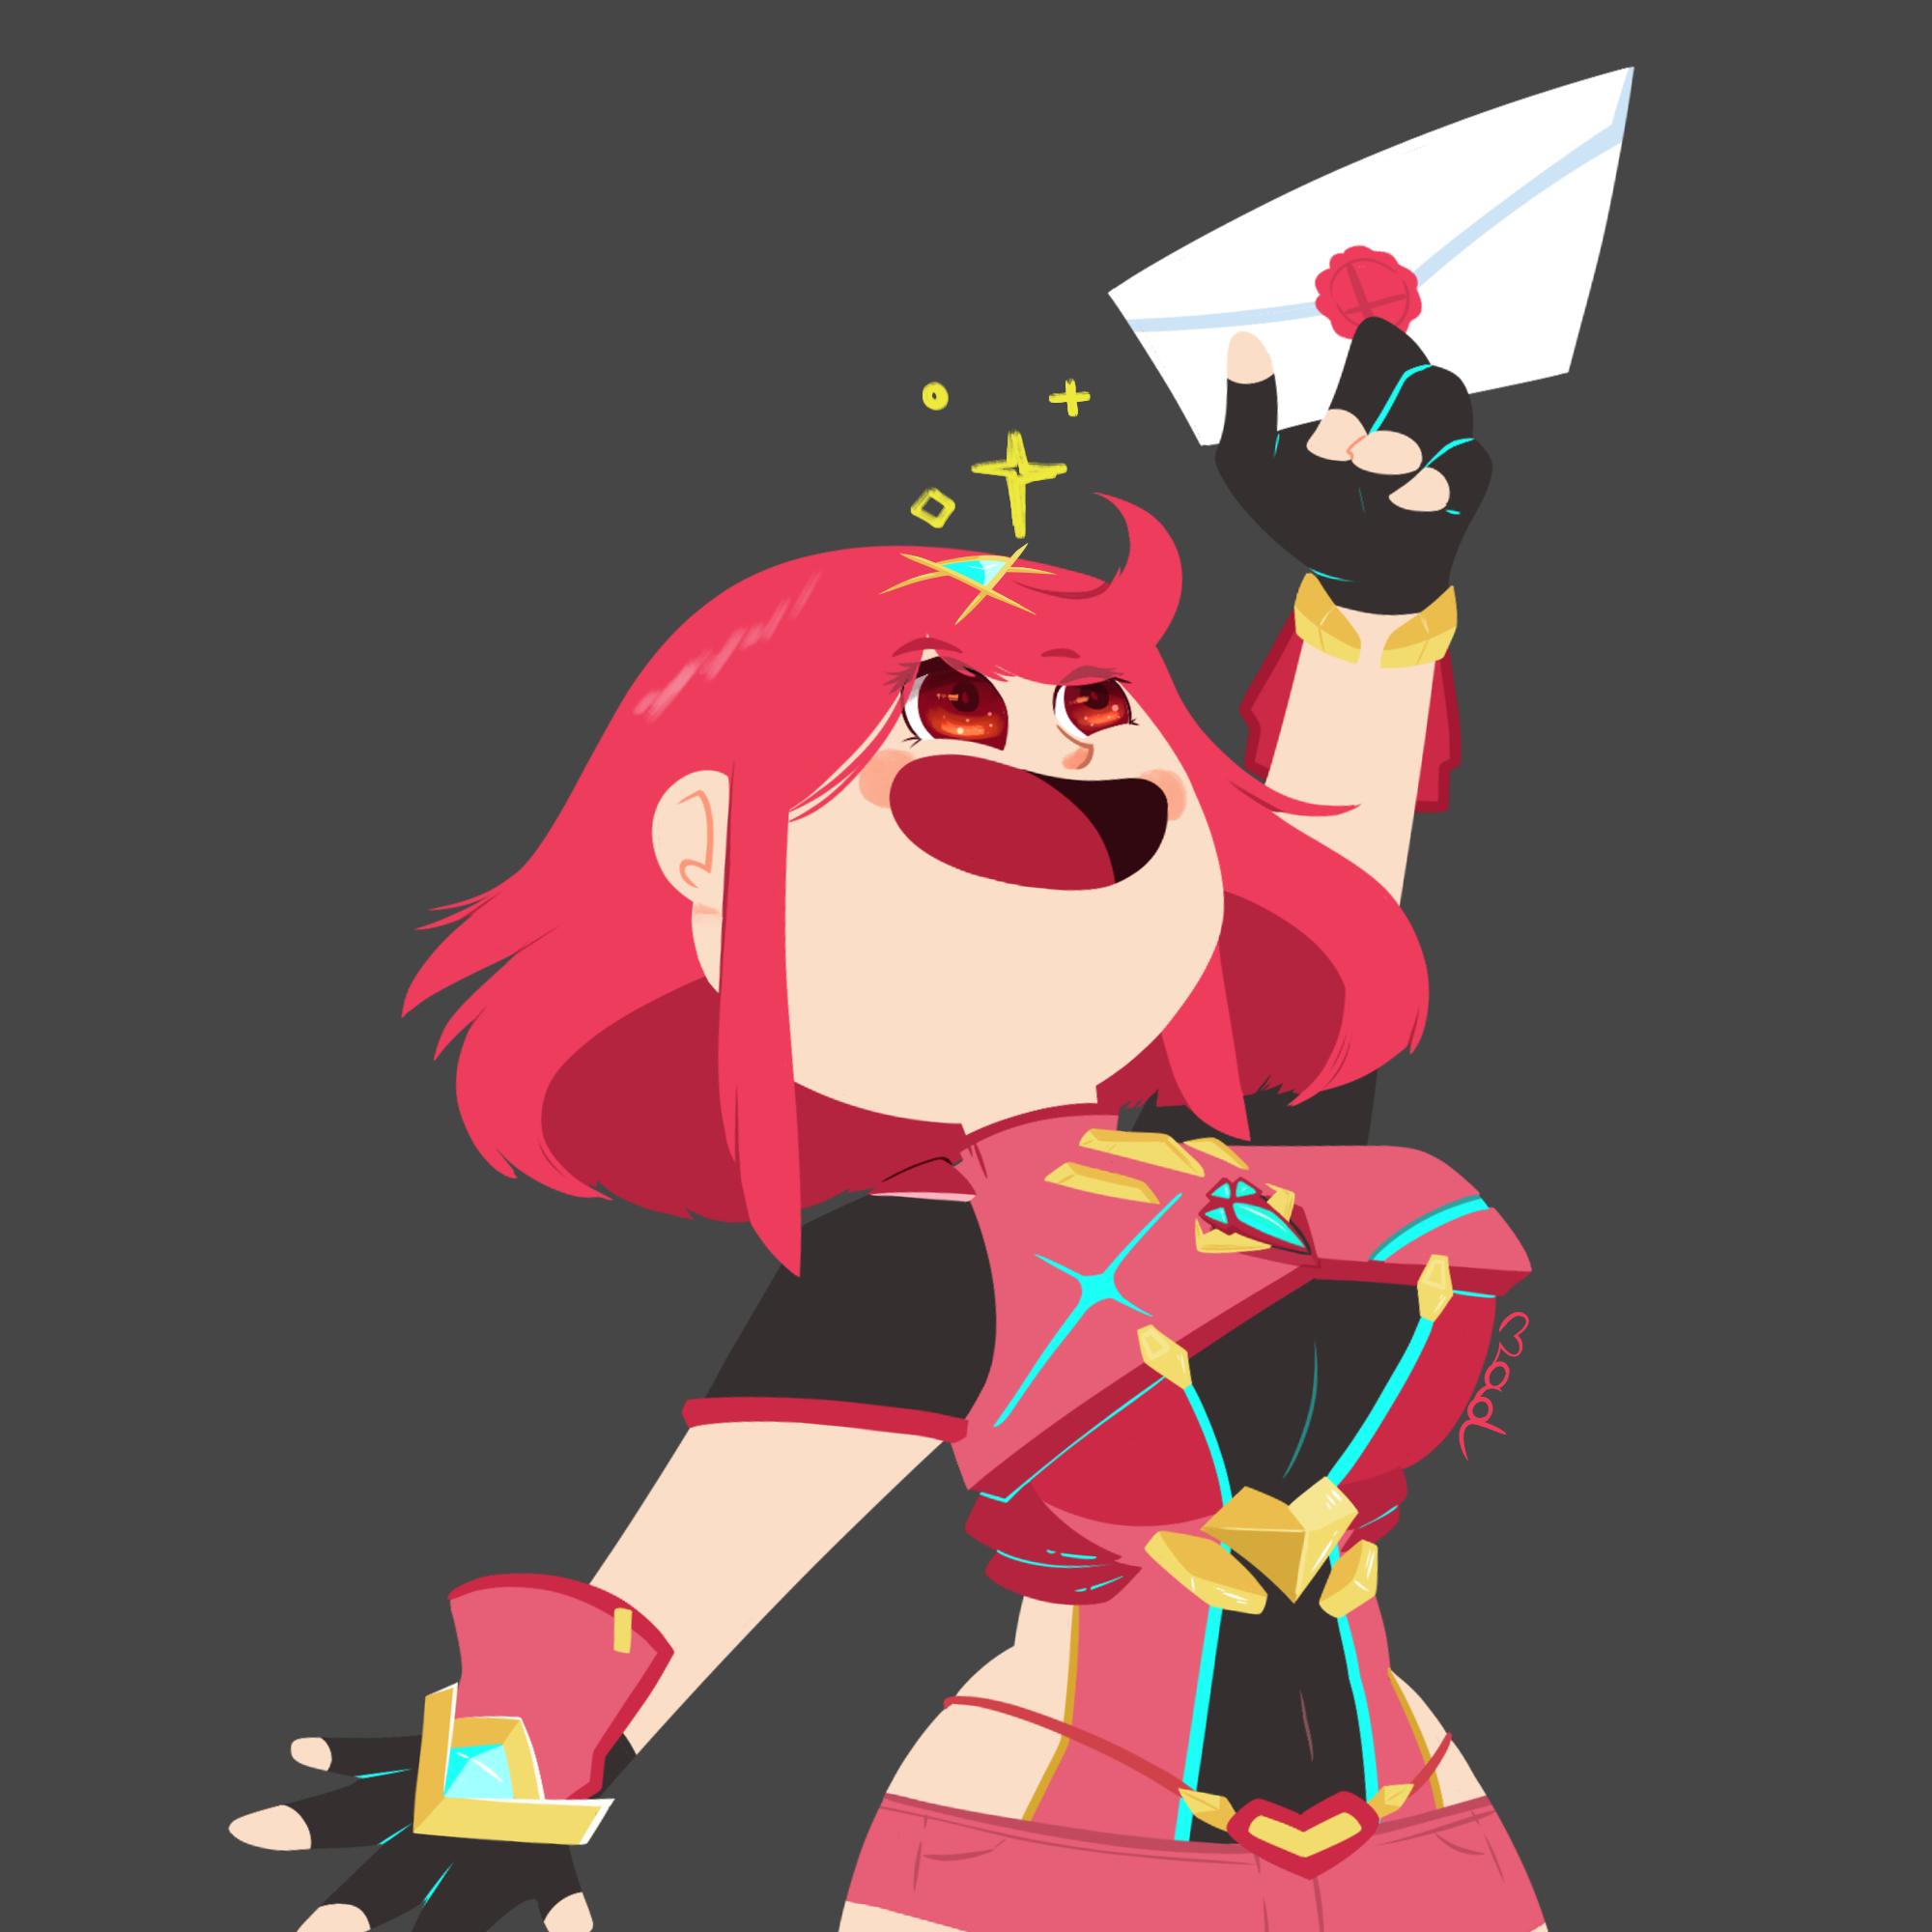 Pyra in Smash!